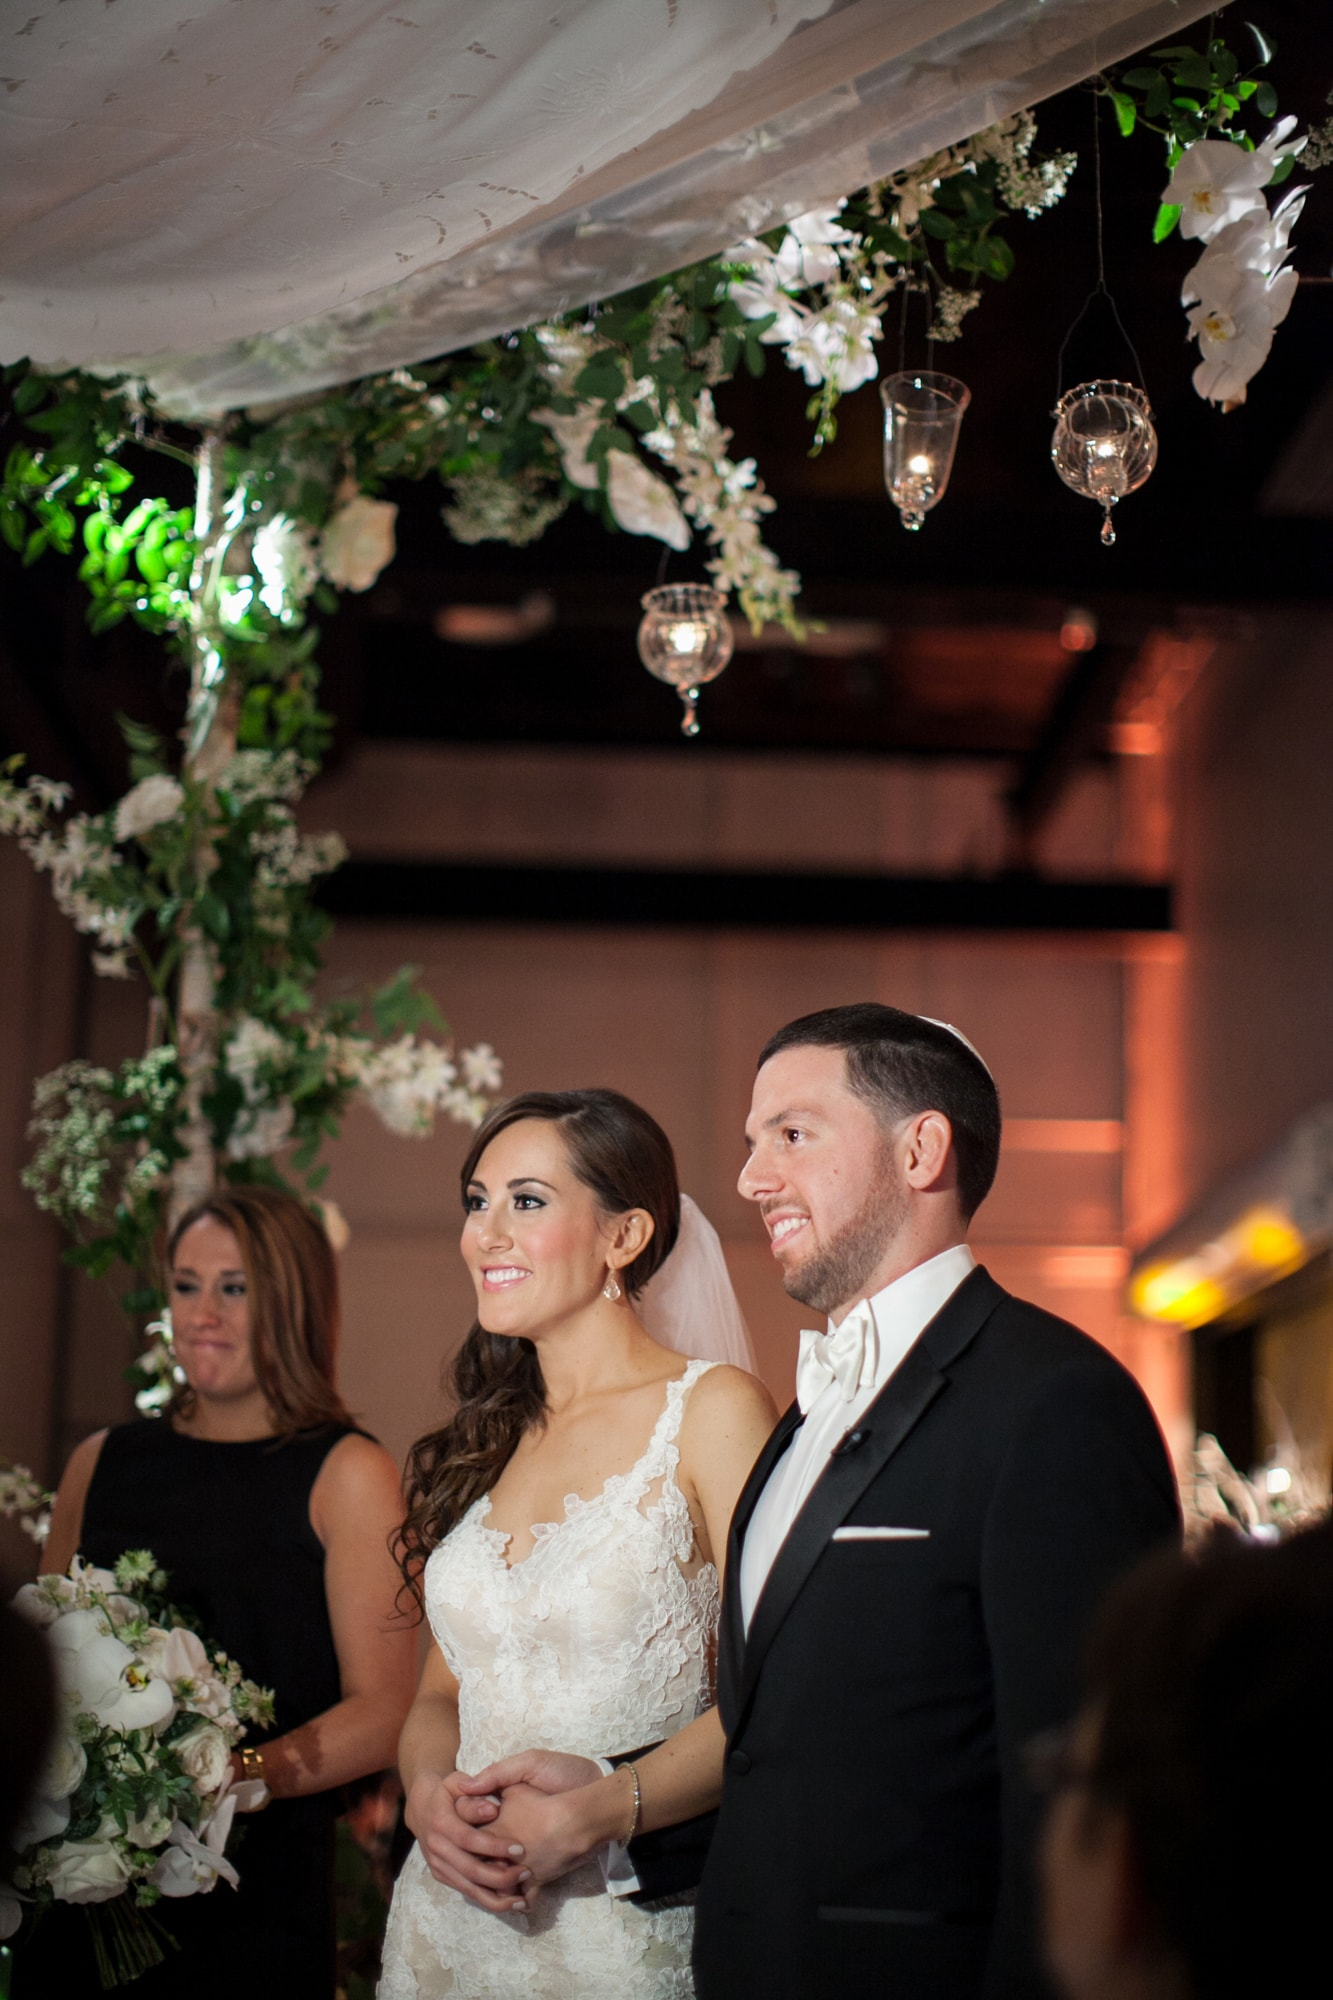 Creative huppa at Jewish Wedding ceremony